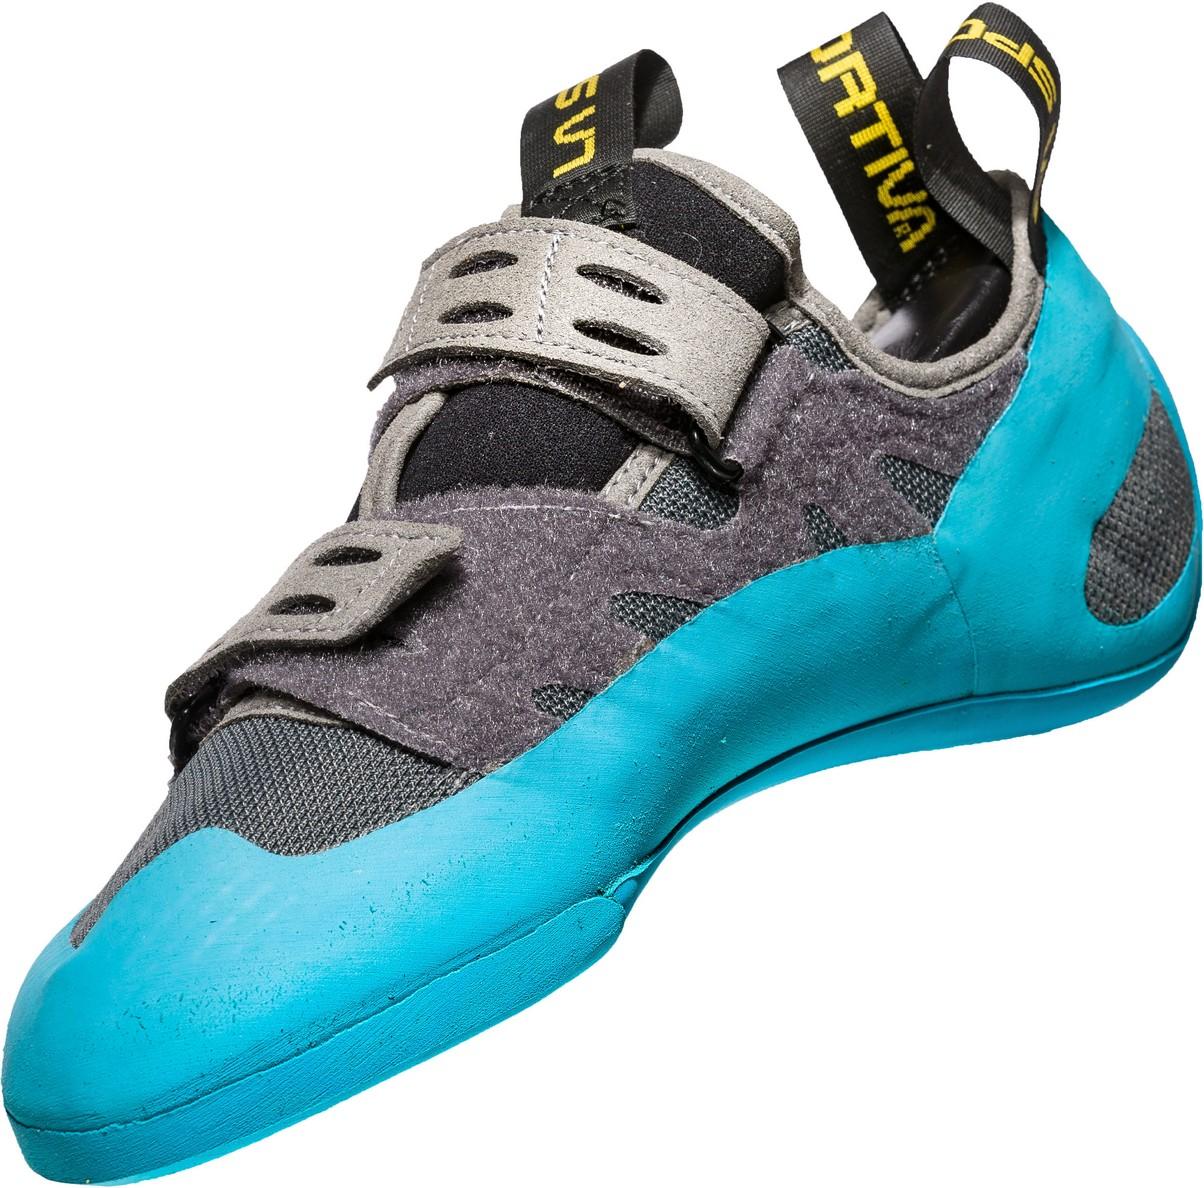 La_Sportiva_Geckogym_Climbing_Shoes_Men_Carbon_Tropic_Blue-1200x1200.jpg